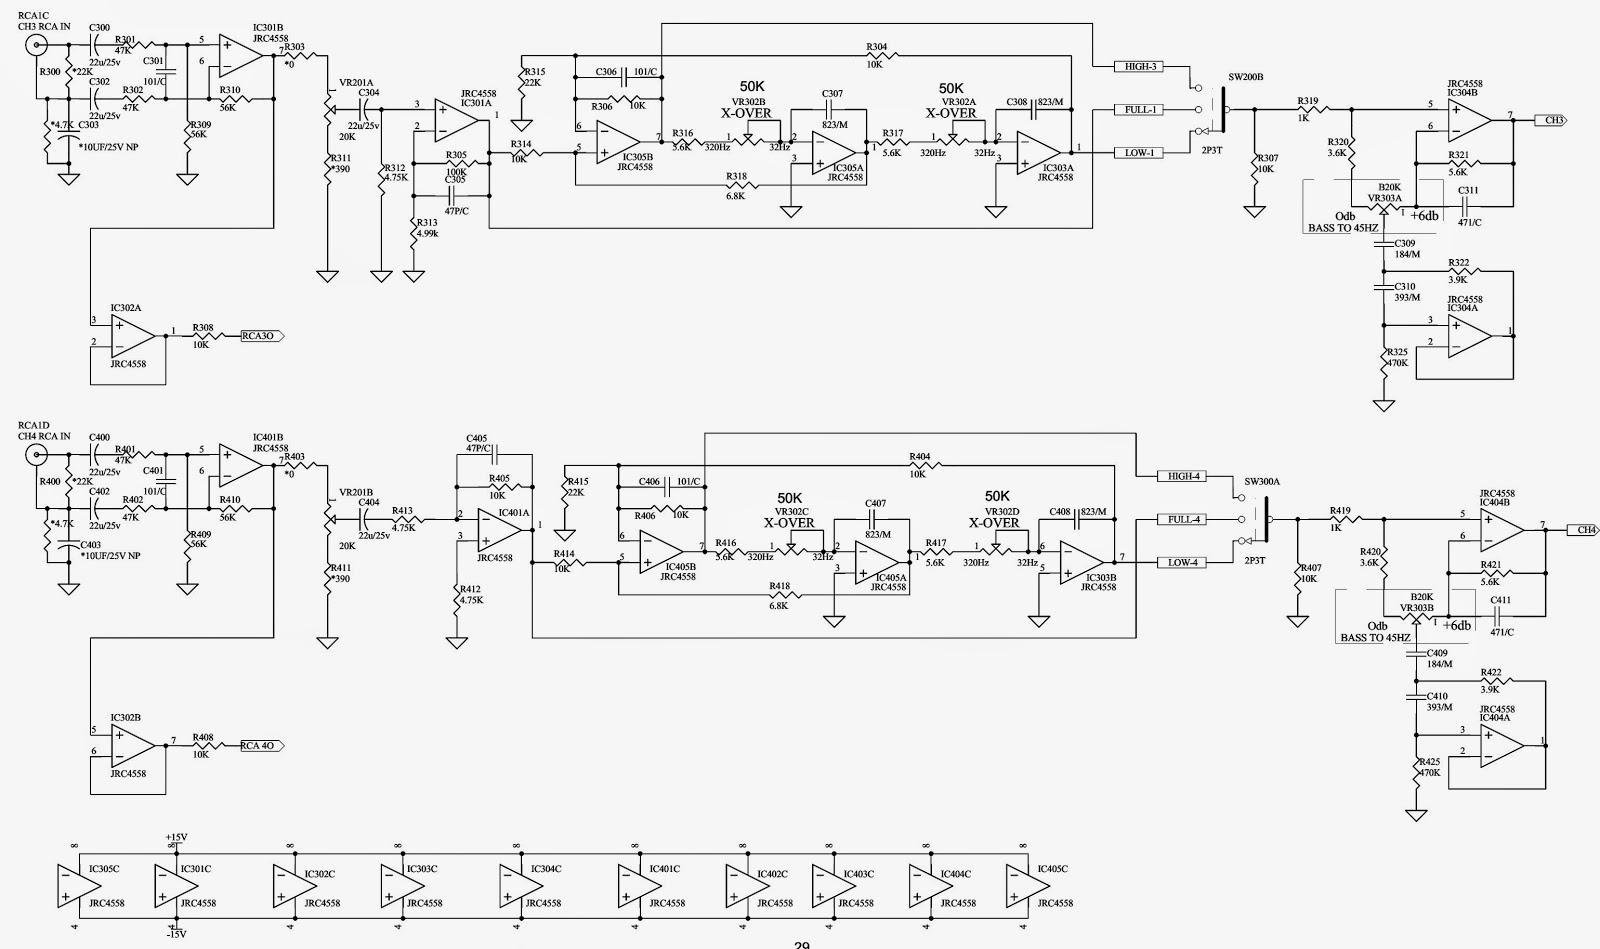 jbl marine stereo wiring diagram toyota tundra radio wiring diagramclarion radio wiring diagram images clarion dxzmp wiring radio wiring diagram 17 marine jbl stereo diagram